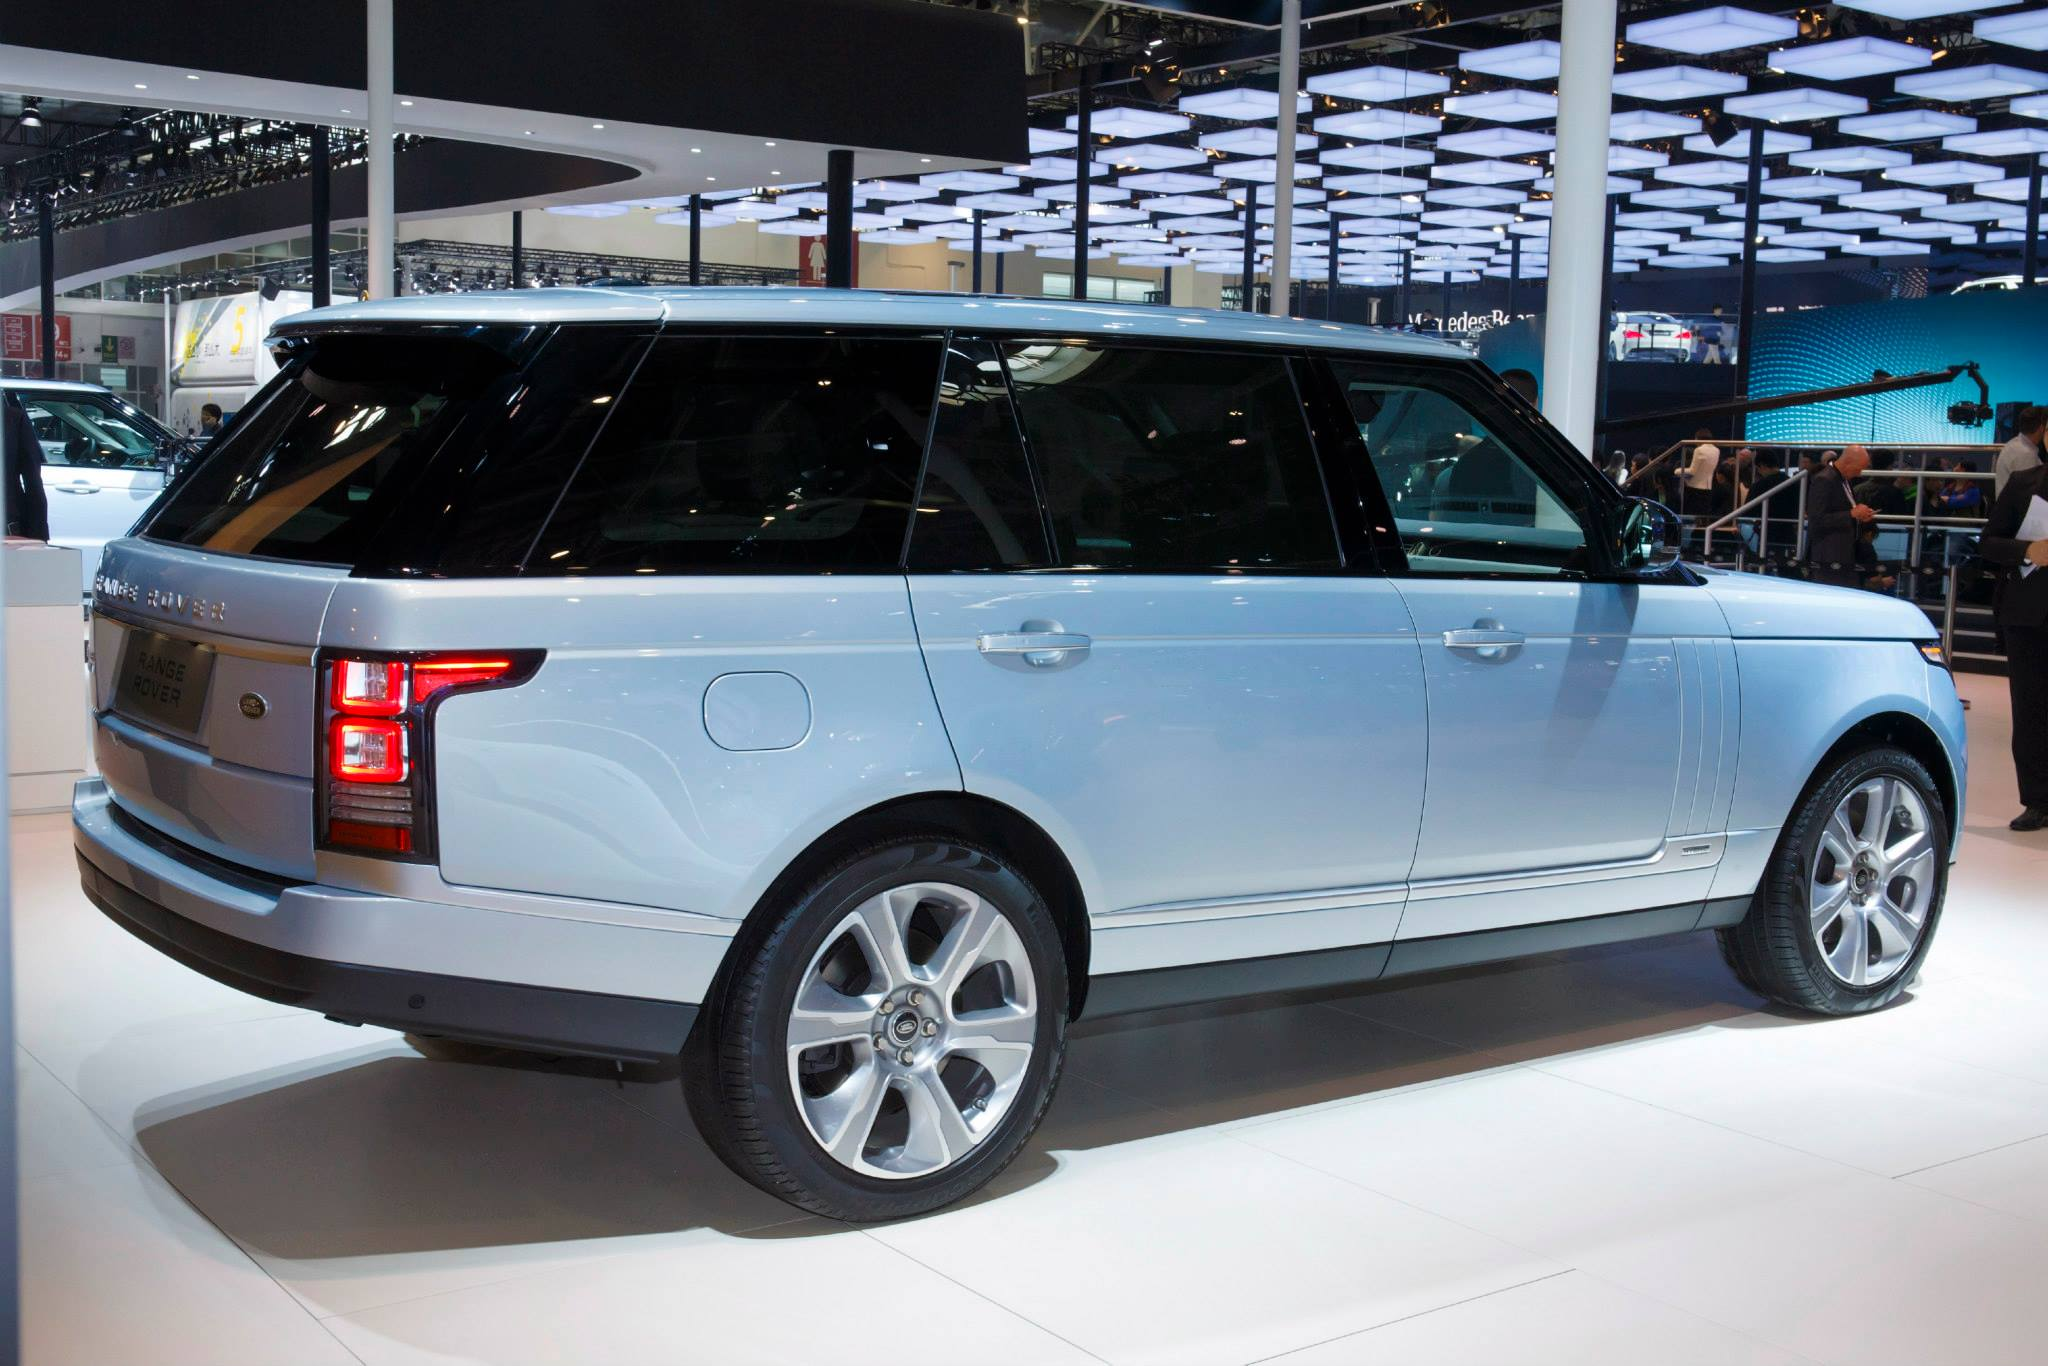 Range Rover Hybrid Long Wheelbase Revealed in China autoevolution